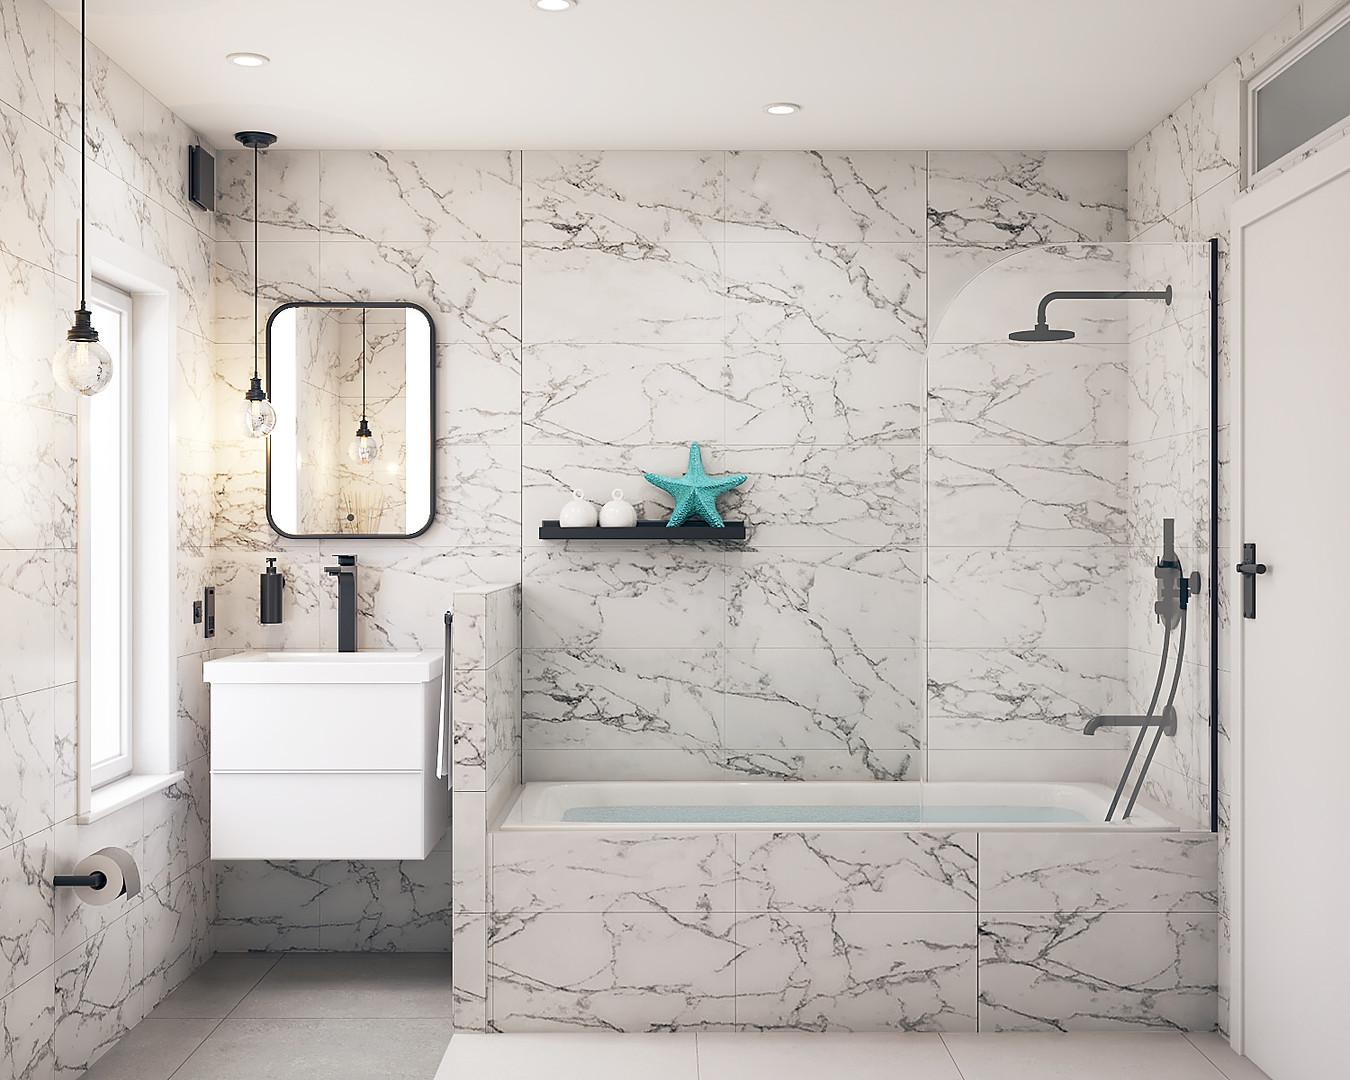 02_Main_bathroom_2A.jpg